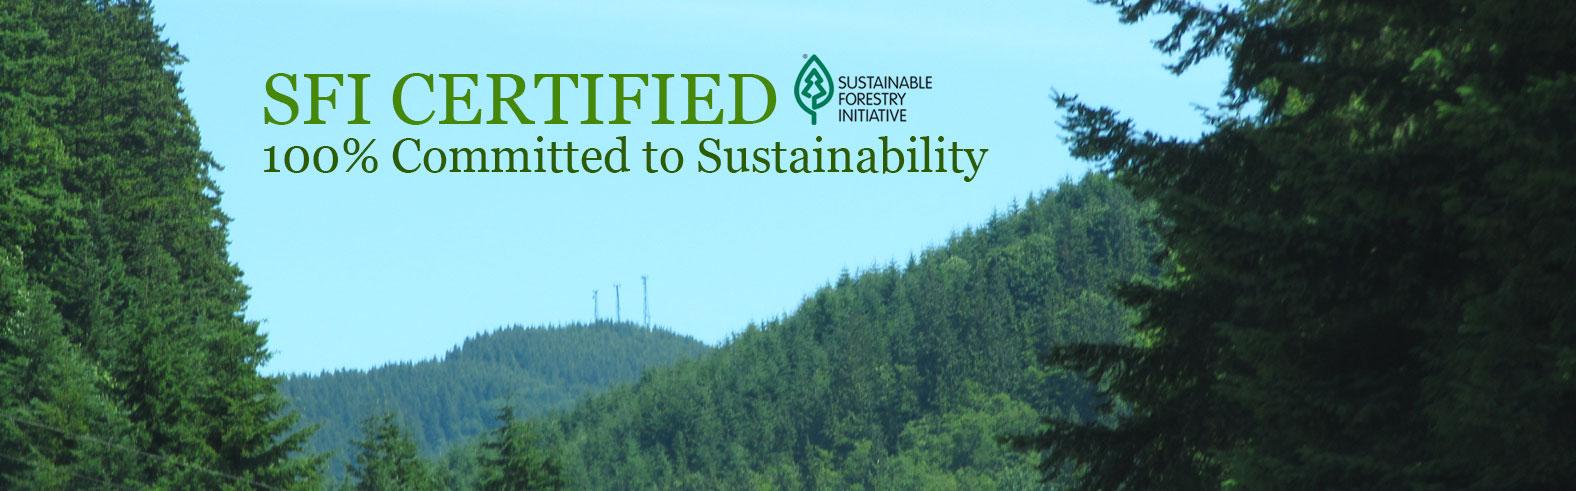 SFI Certified